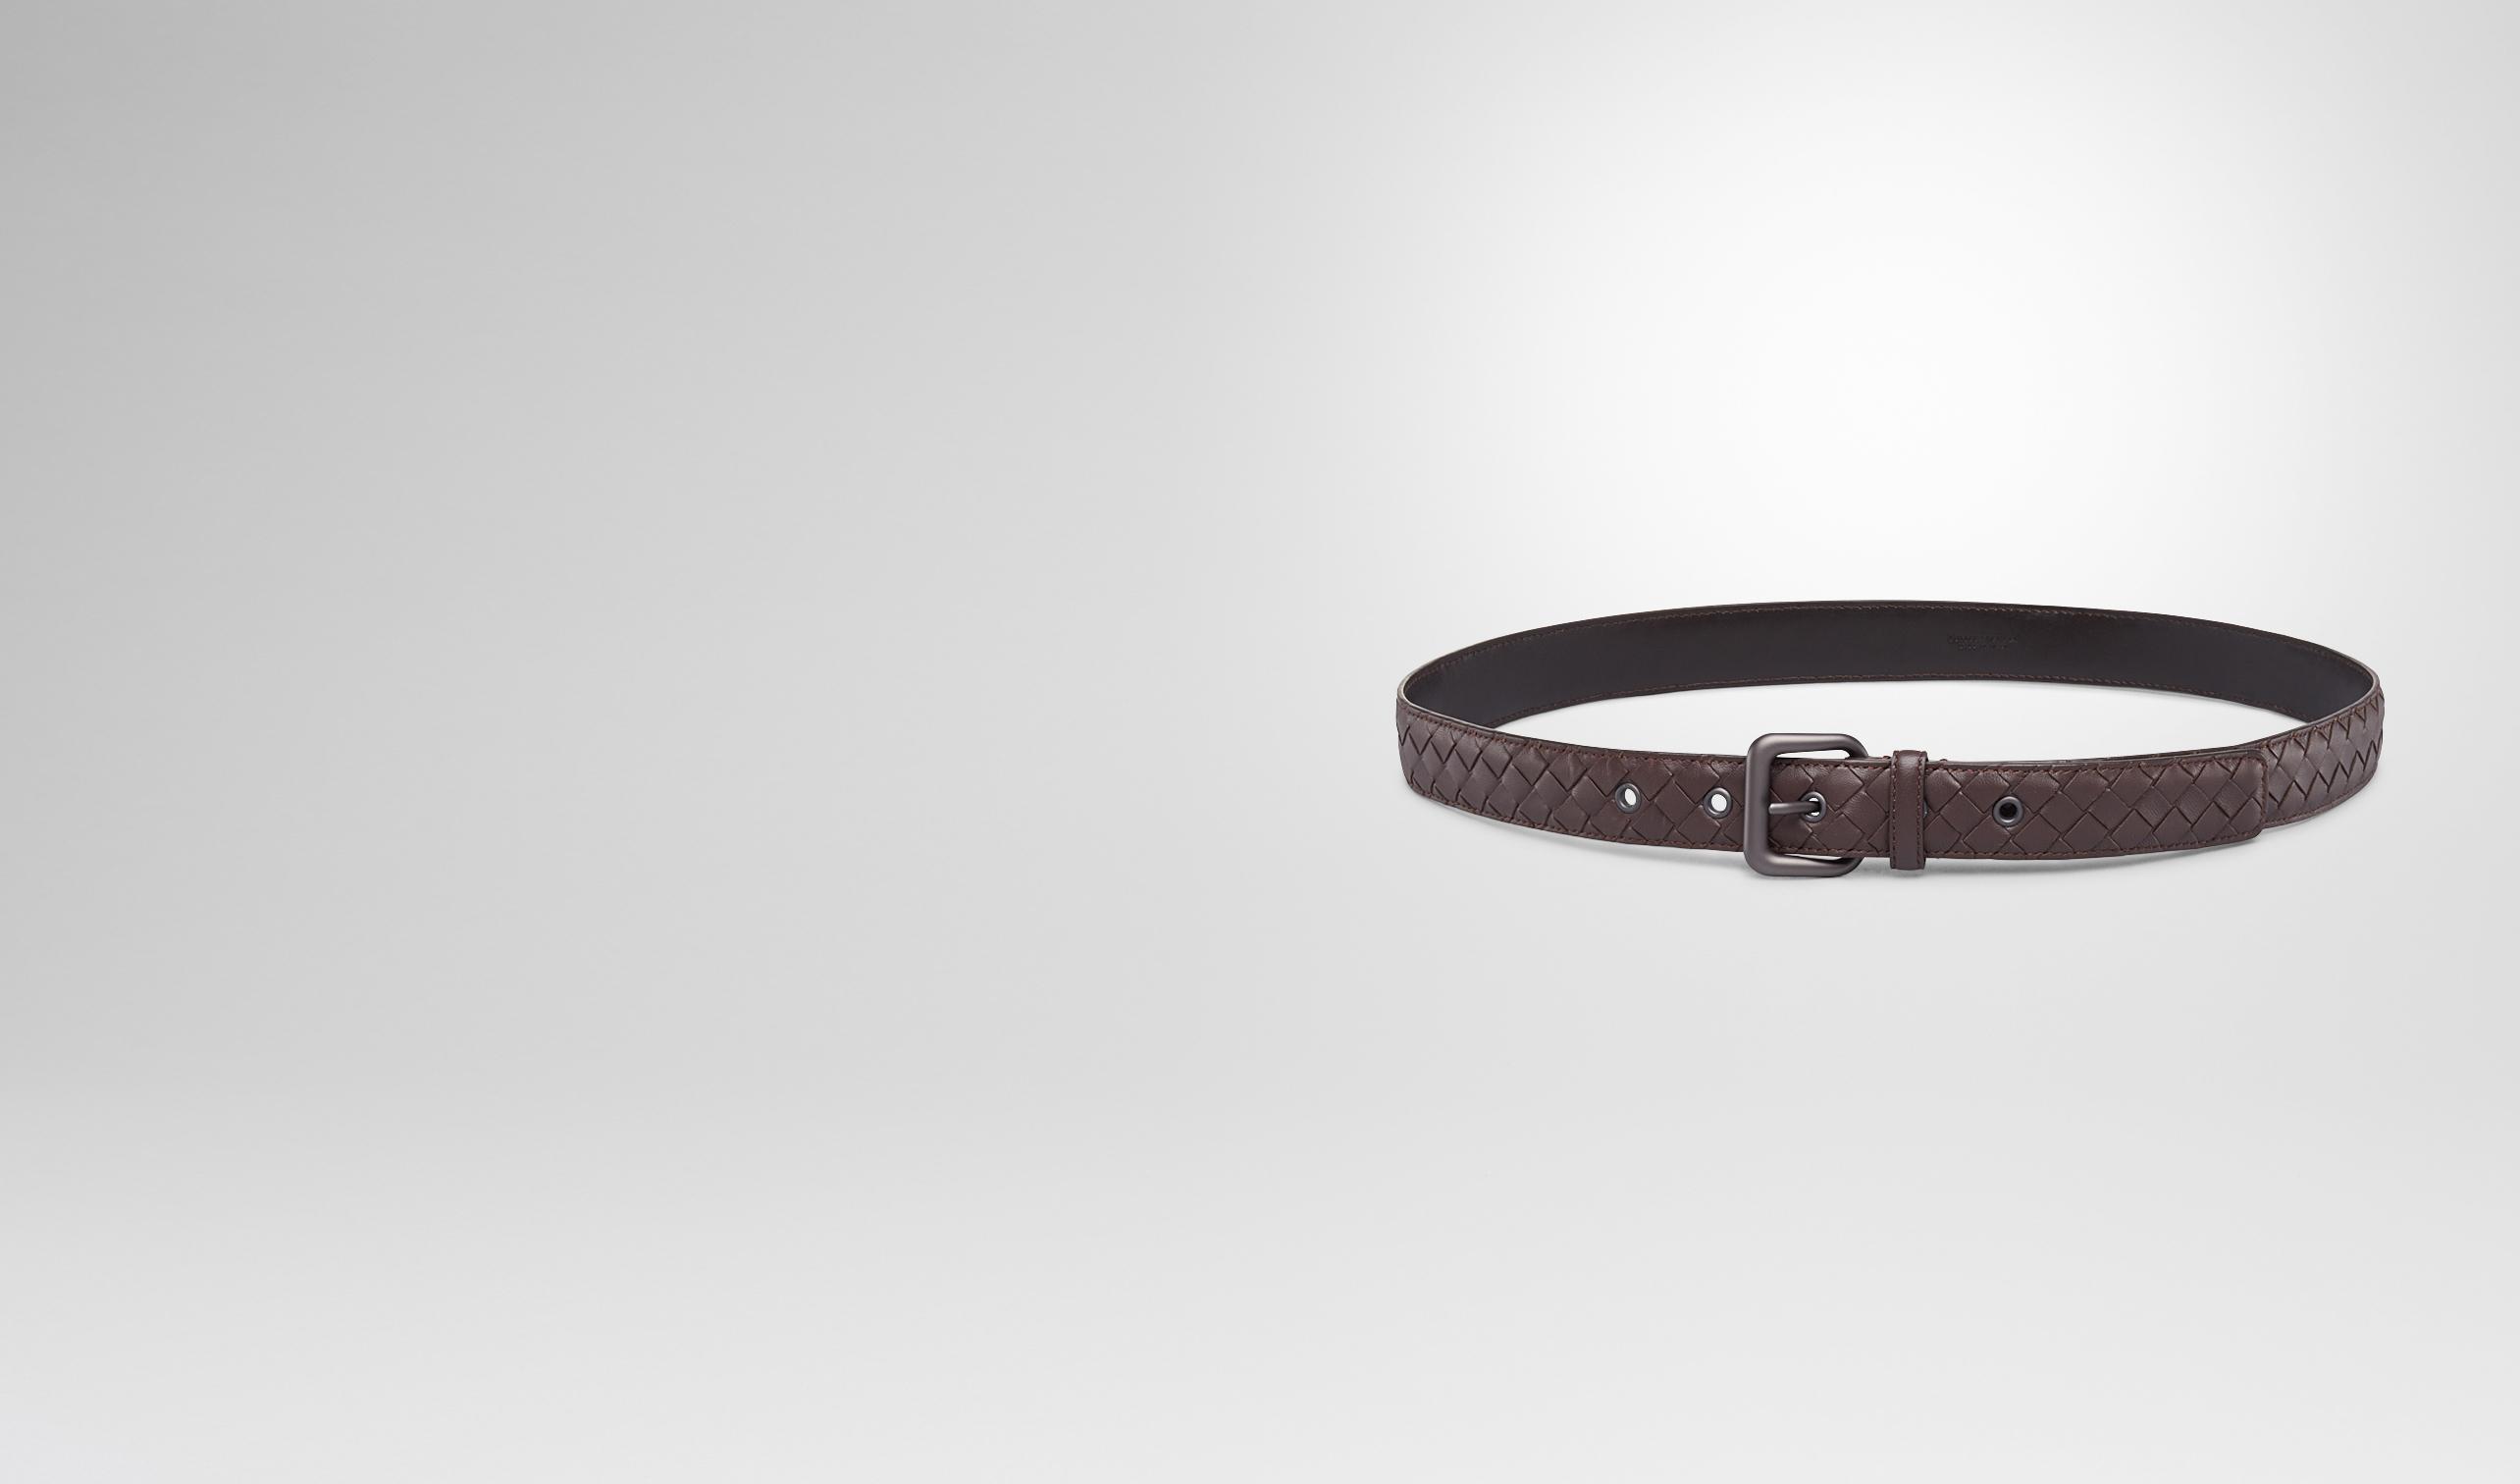 BOTTEGA VENETA Cintura D Cintura Ebano in Nappa Intrecciata pl